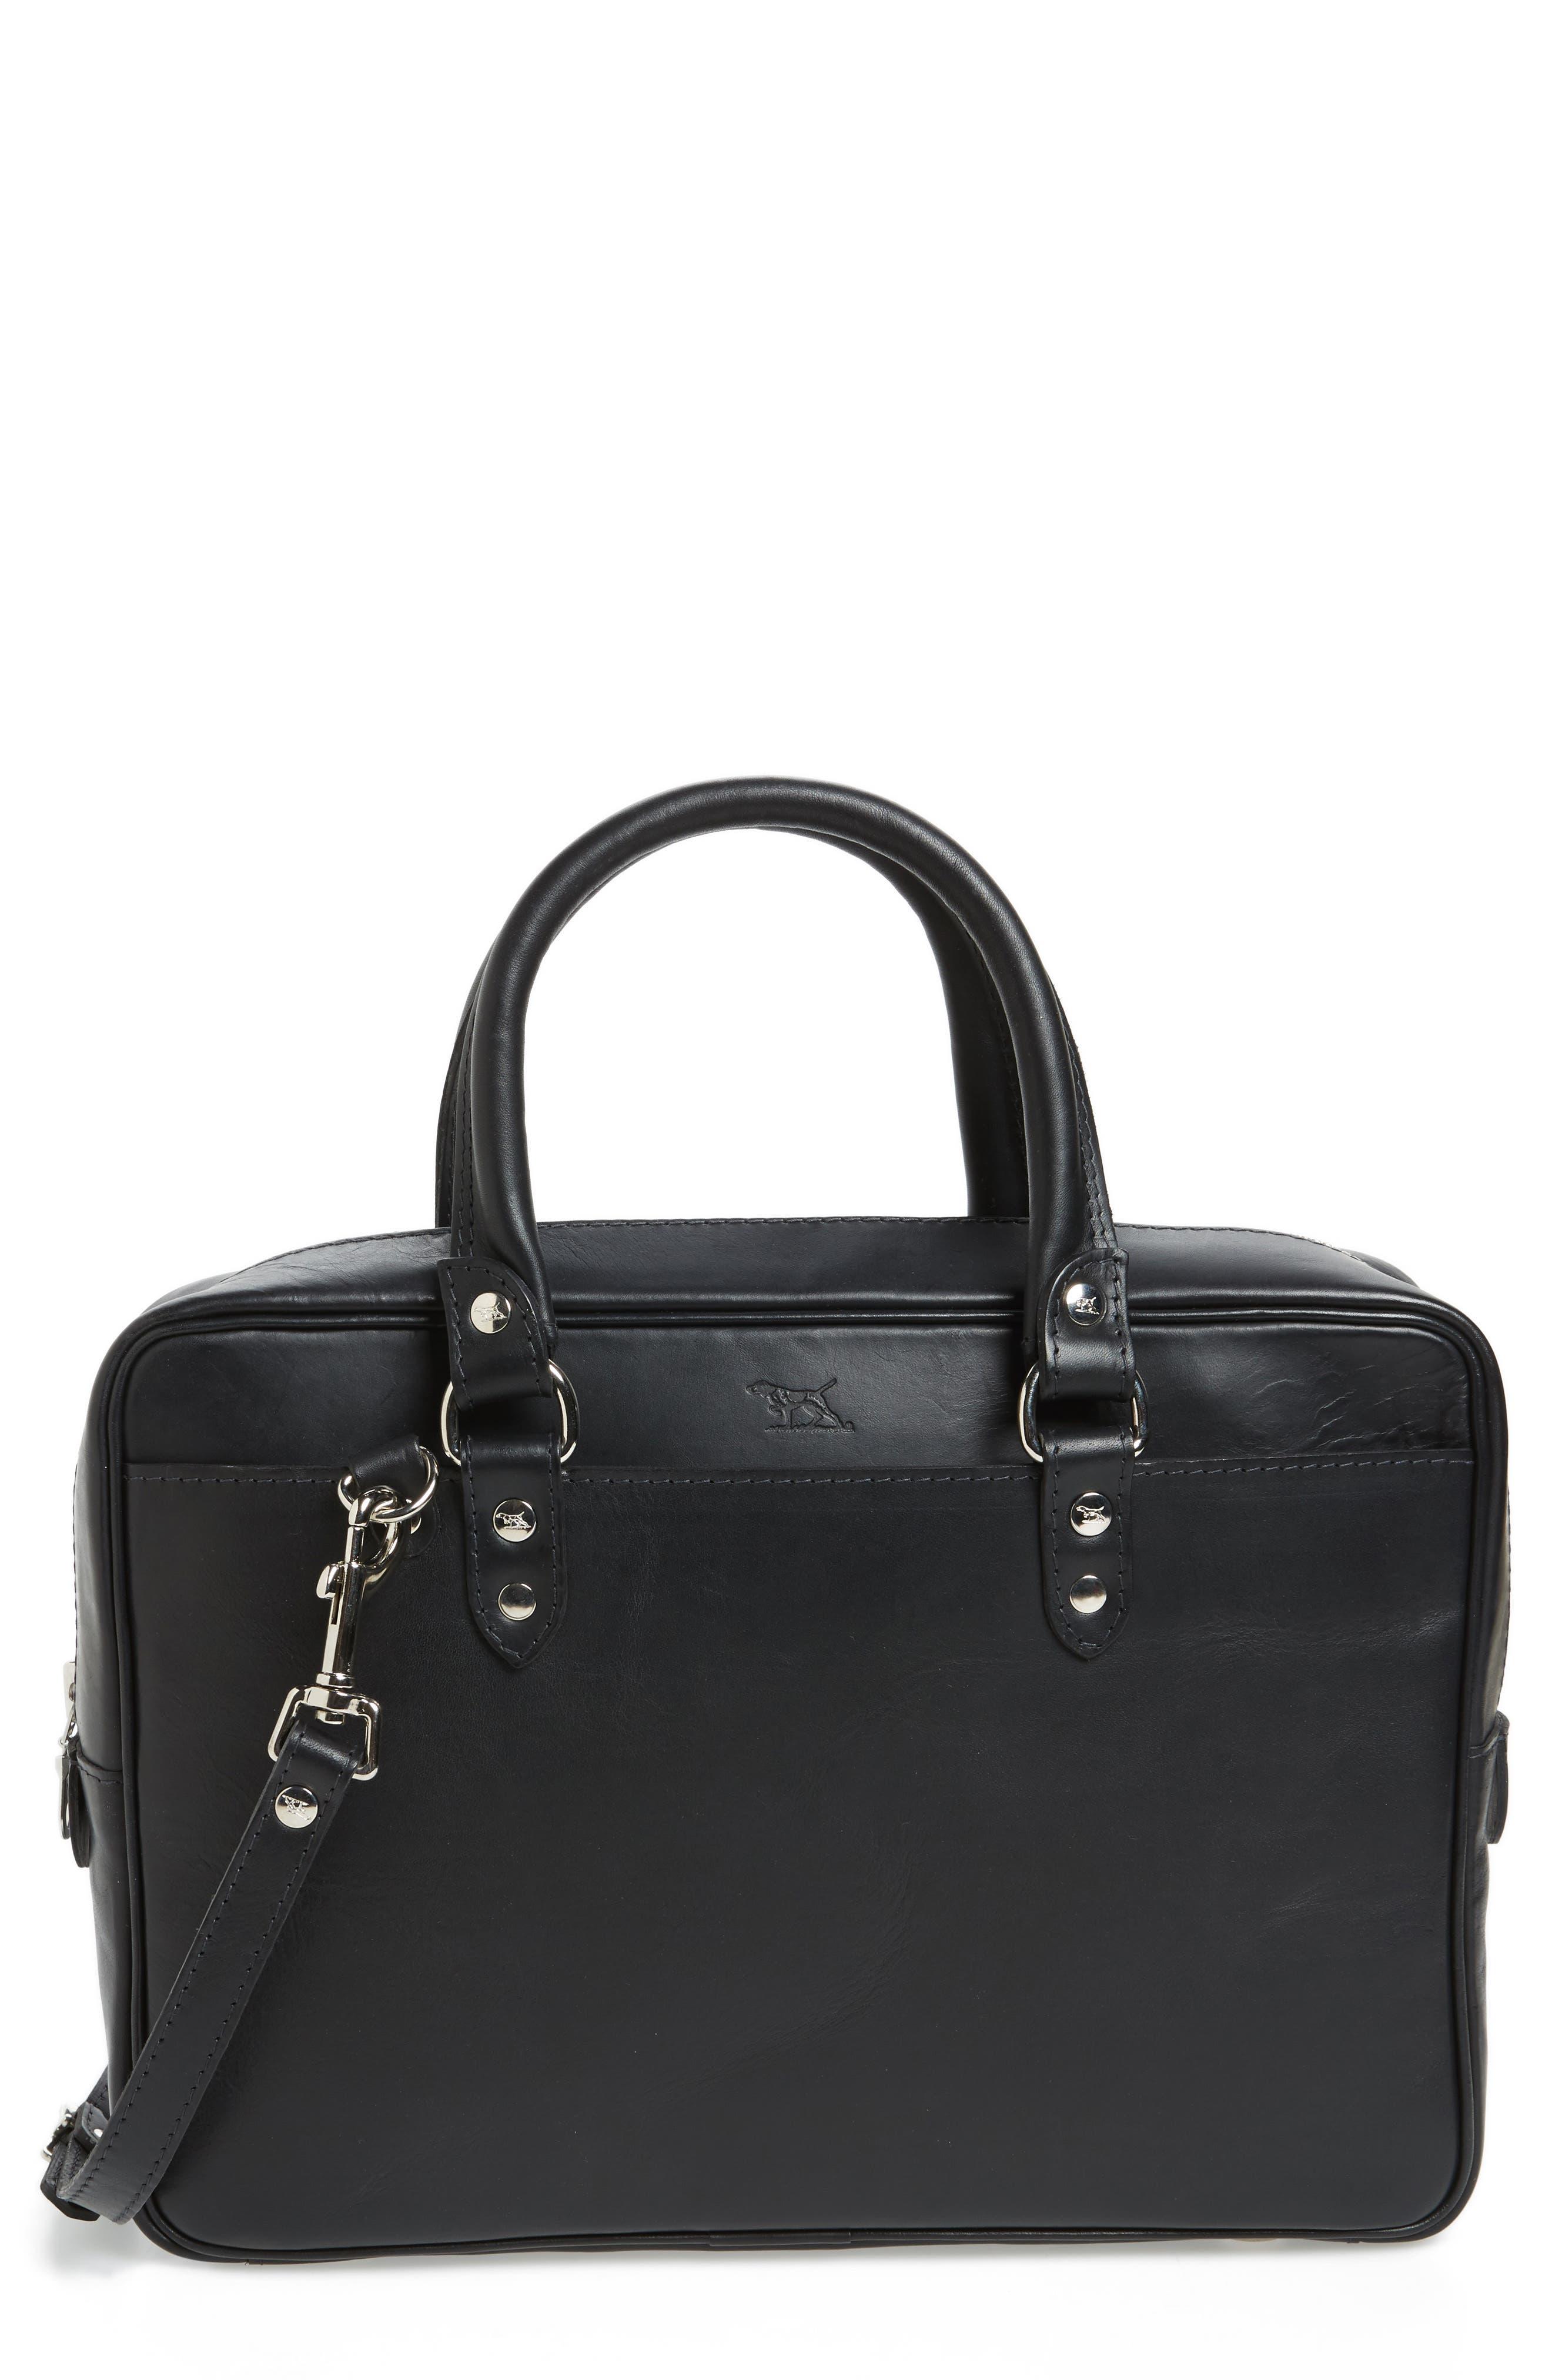 Rodd & Gunn New Roxburgh Leather Briefcase